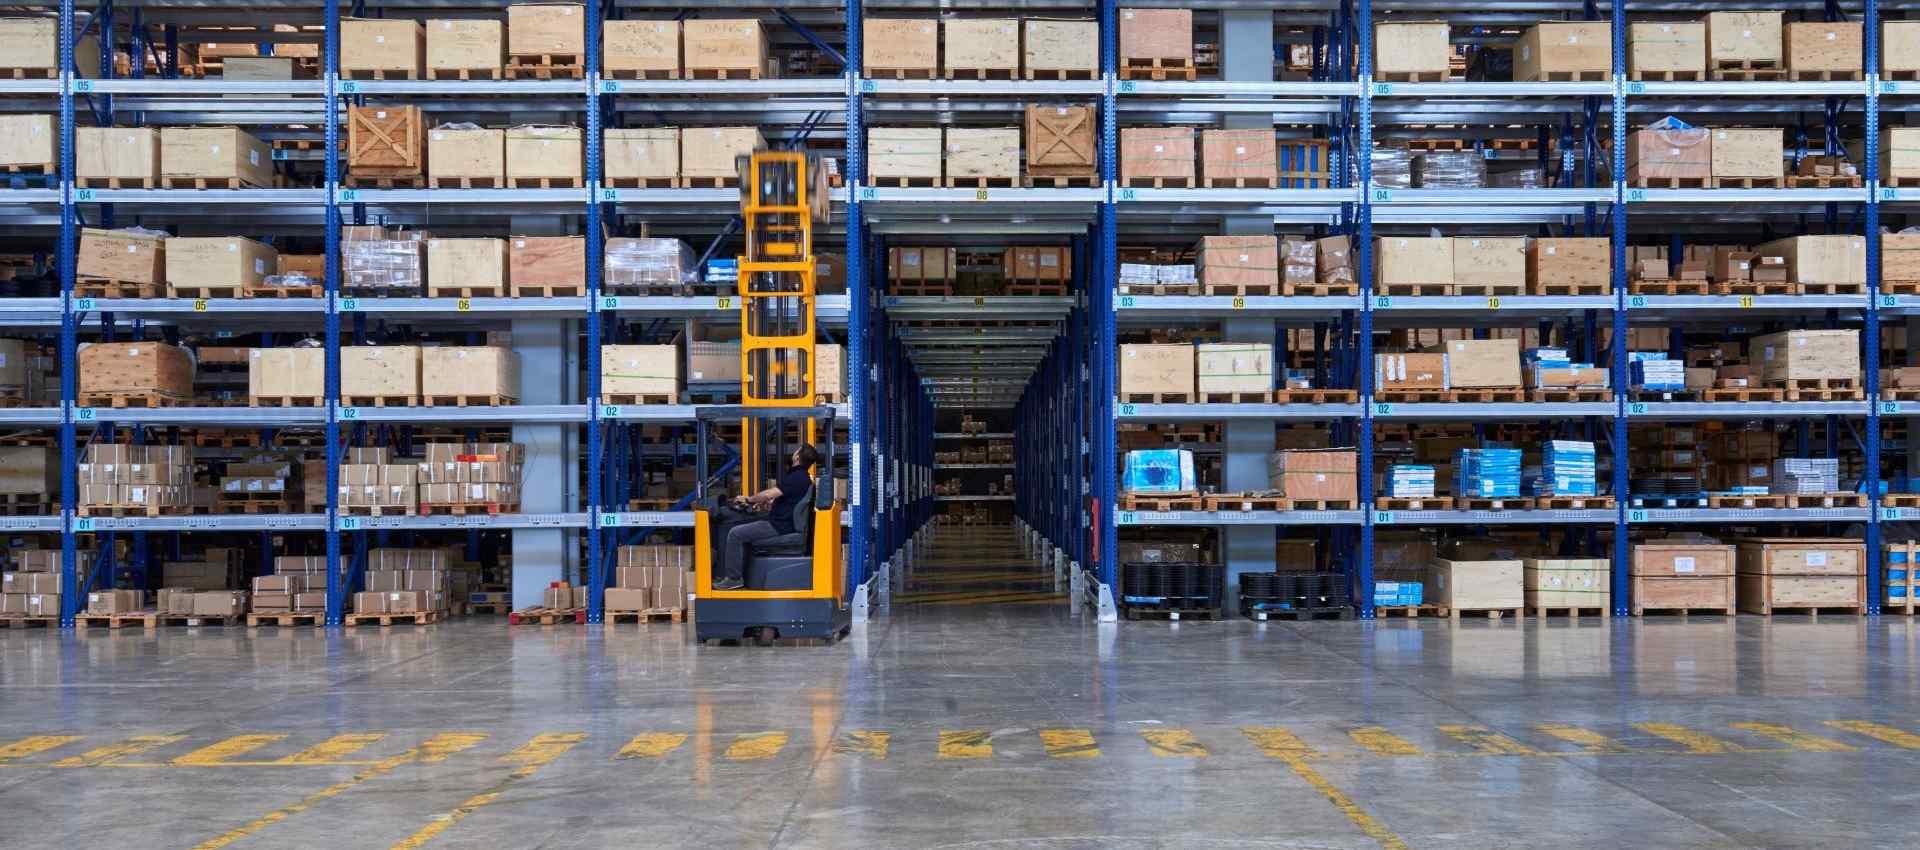 Warehouse Organization Ideas to Help You Increase Efficiency